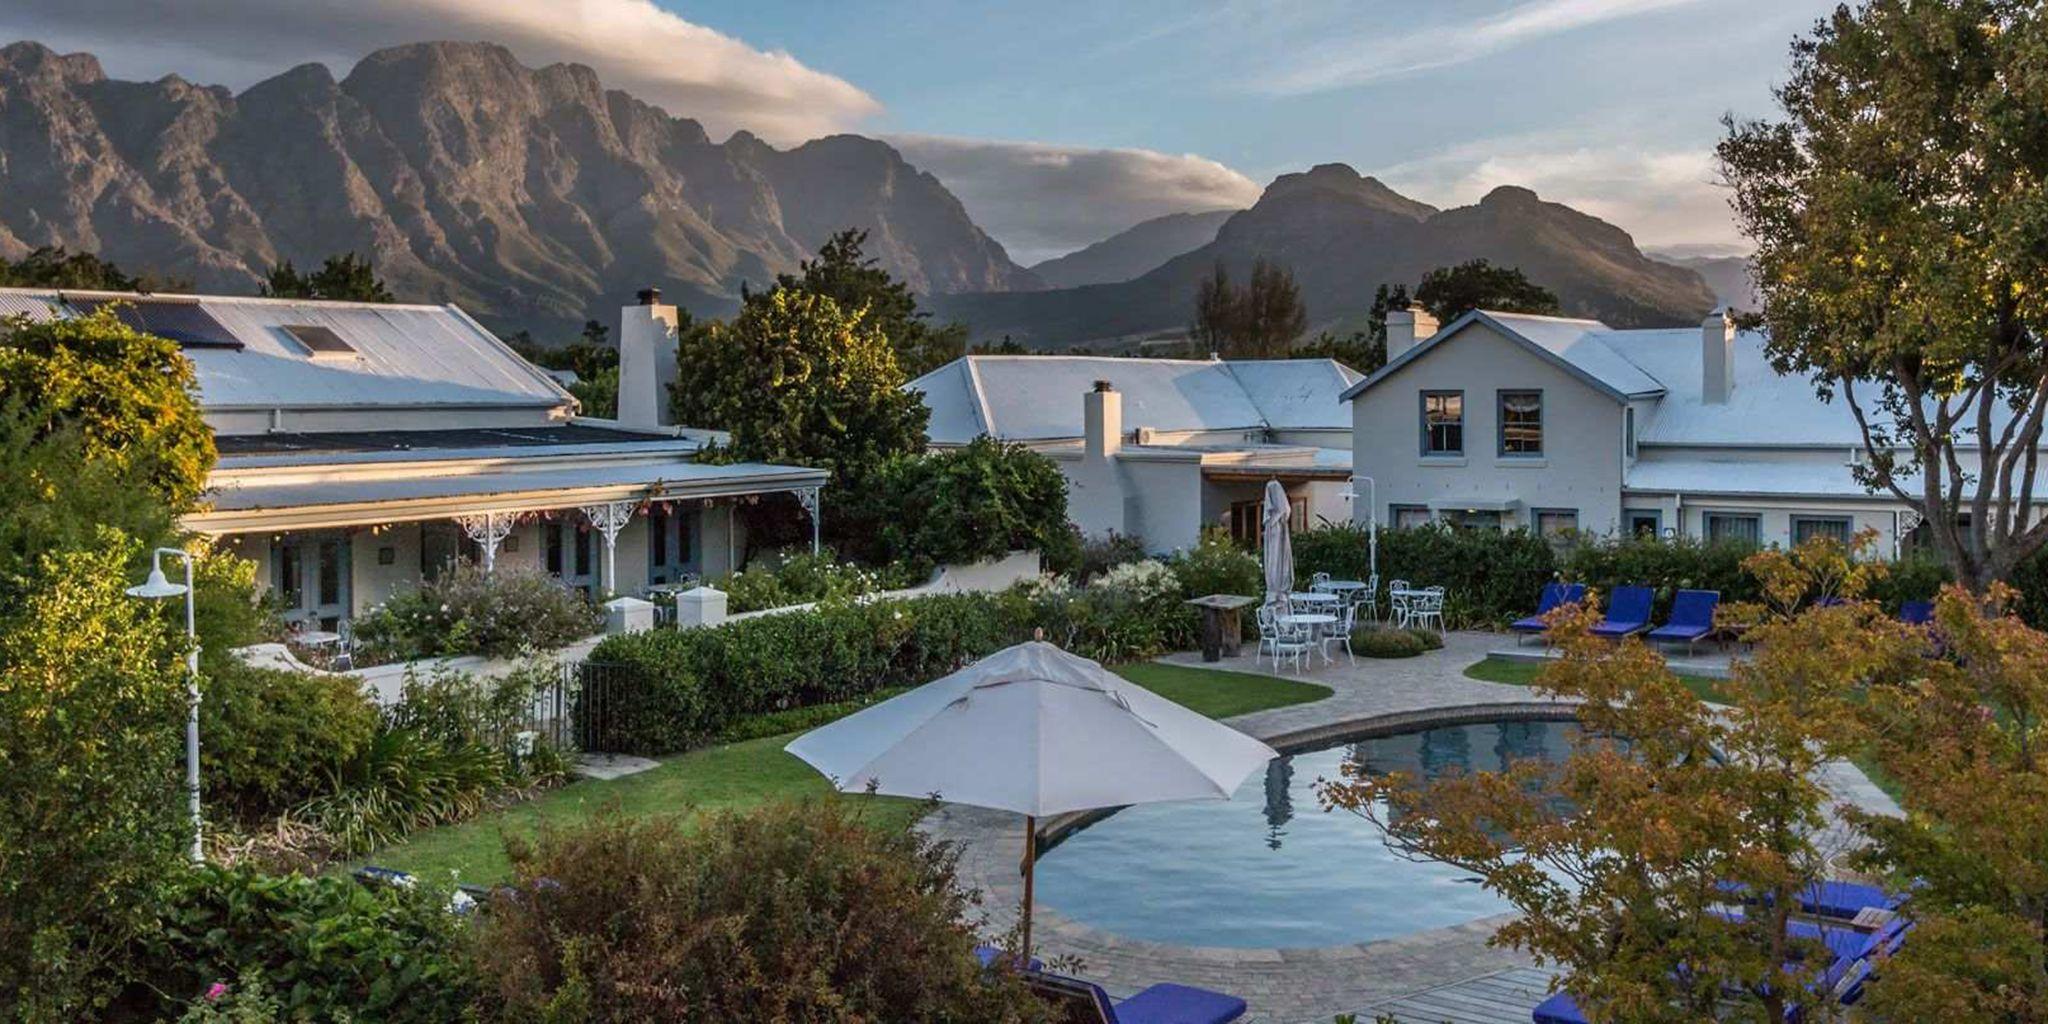 Luxury Hotels In Franschhoek South Africa